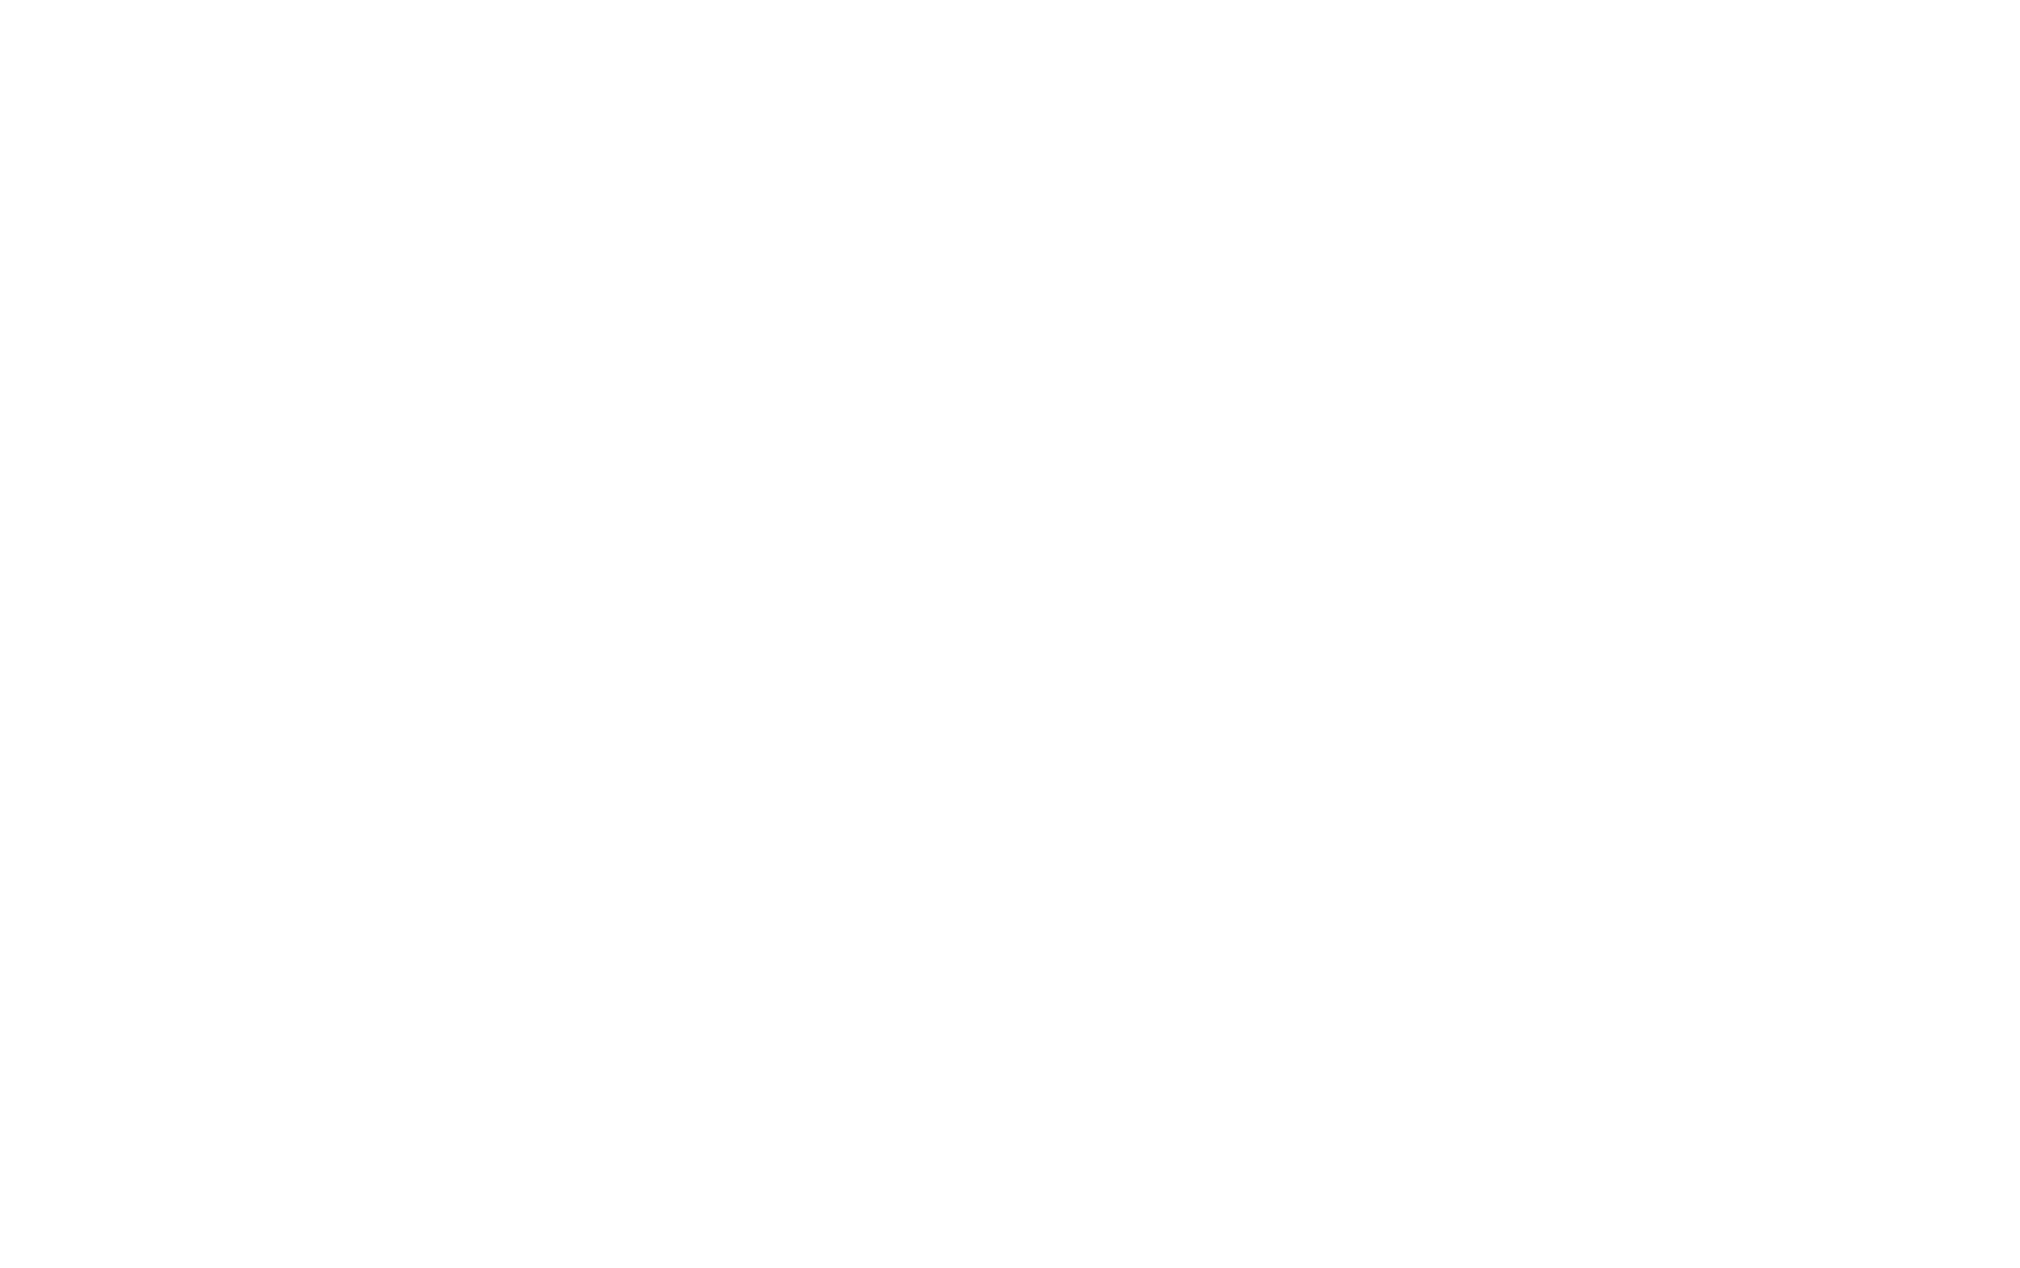 Logo plataform LMS Eadbox